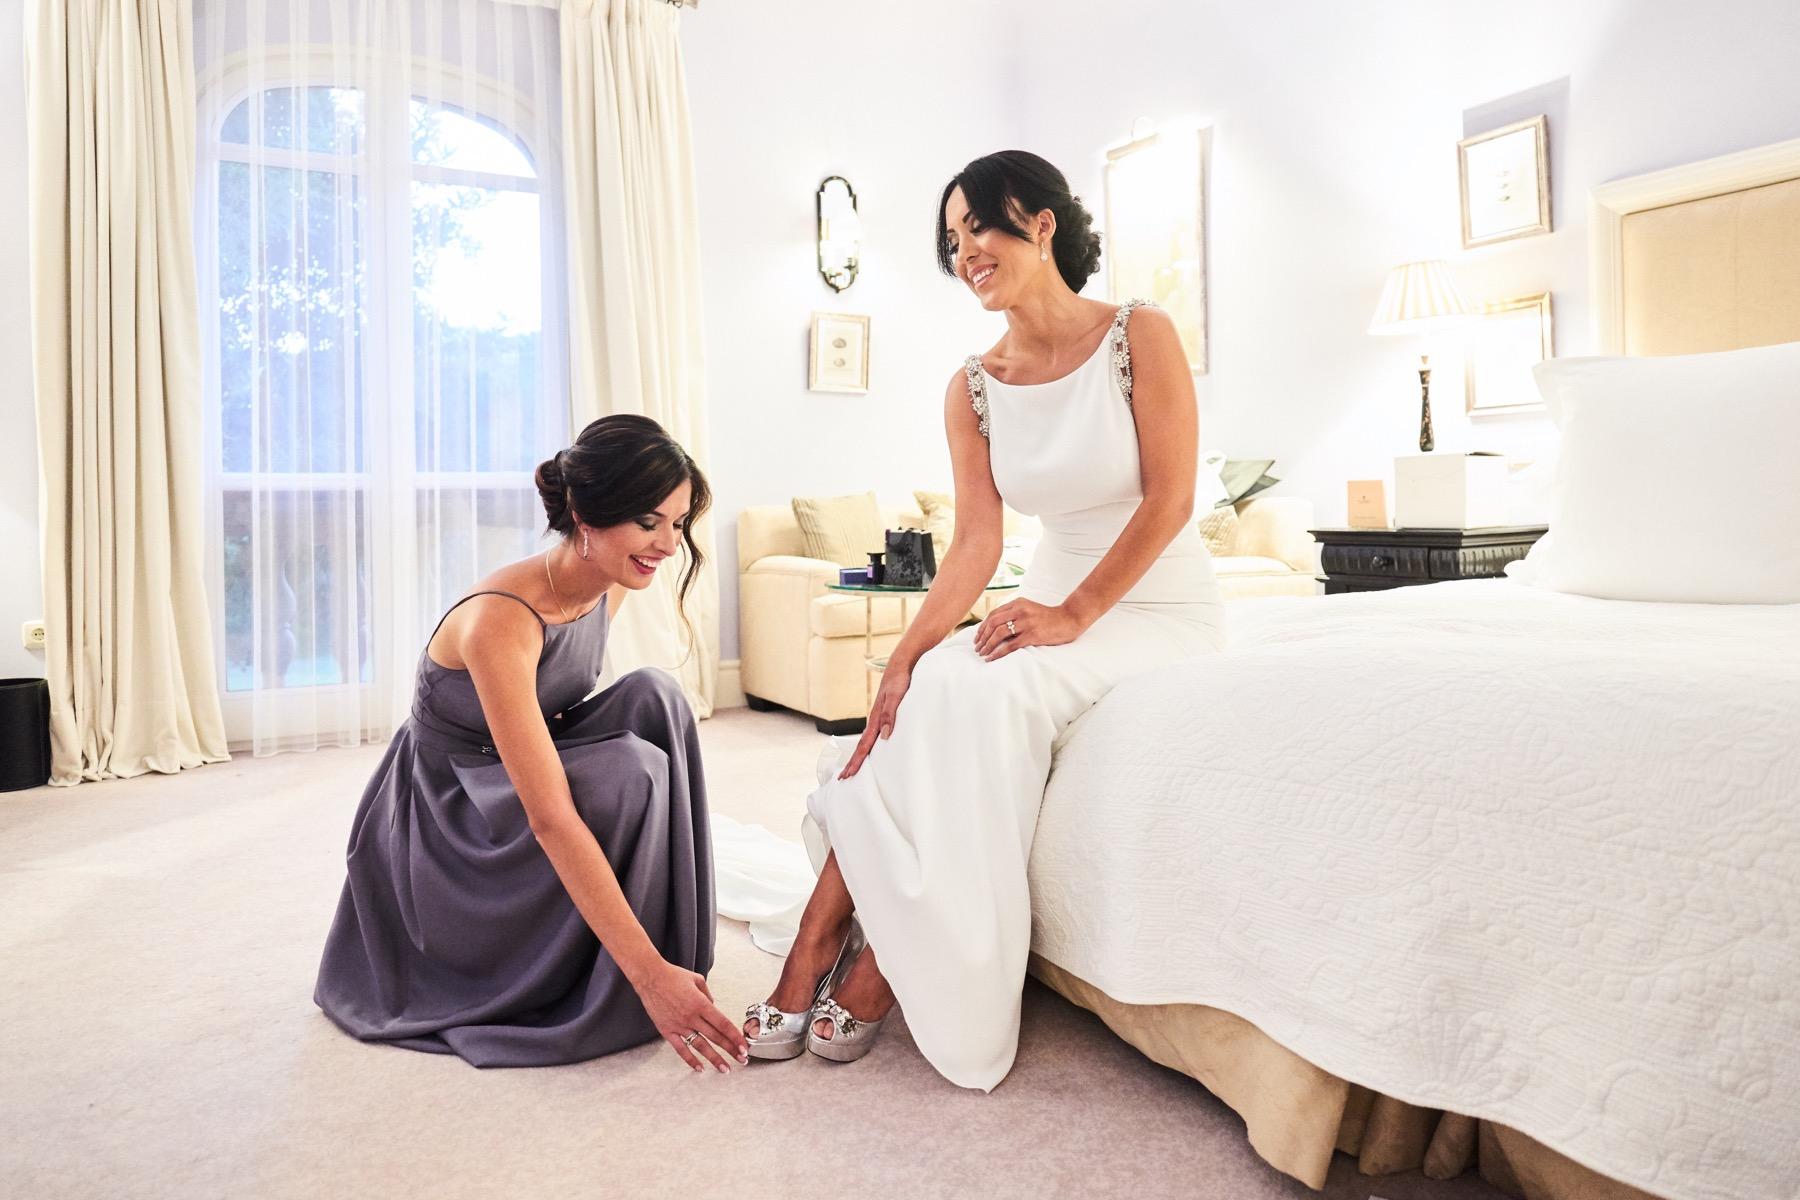 Si-Quiero-Wedding-Planner-By-Sira-Antequera-Bodas-Málaga-Marbella-Miami- Mariam-Guillermo-3